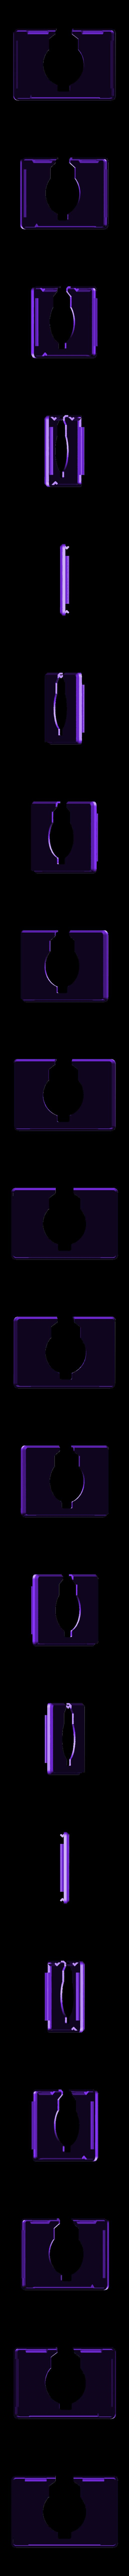 front-cover.stl Download free STL file Raspberry Pi HQ Camera Case • 3D print design, Adafruit